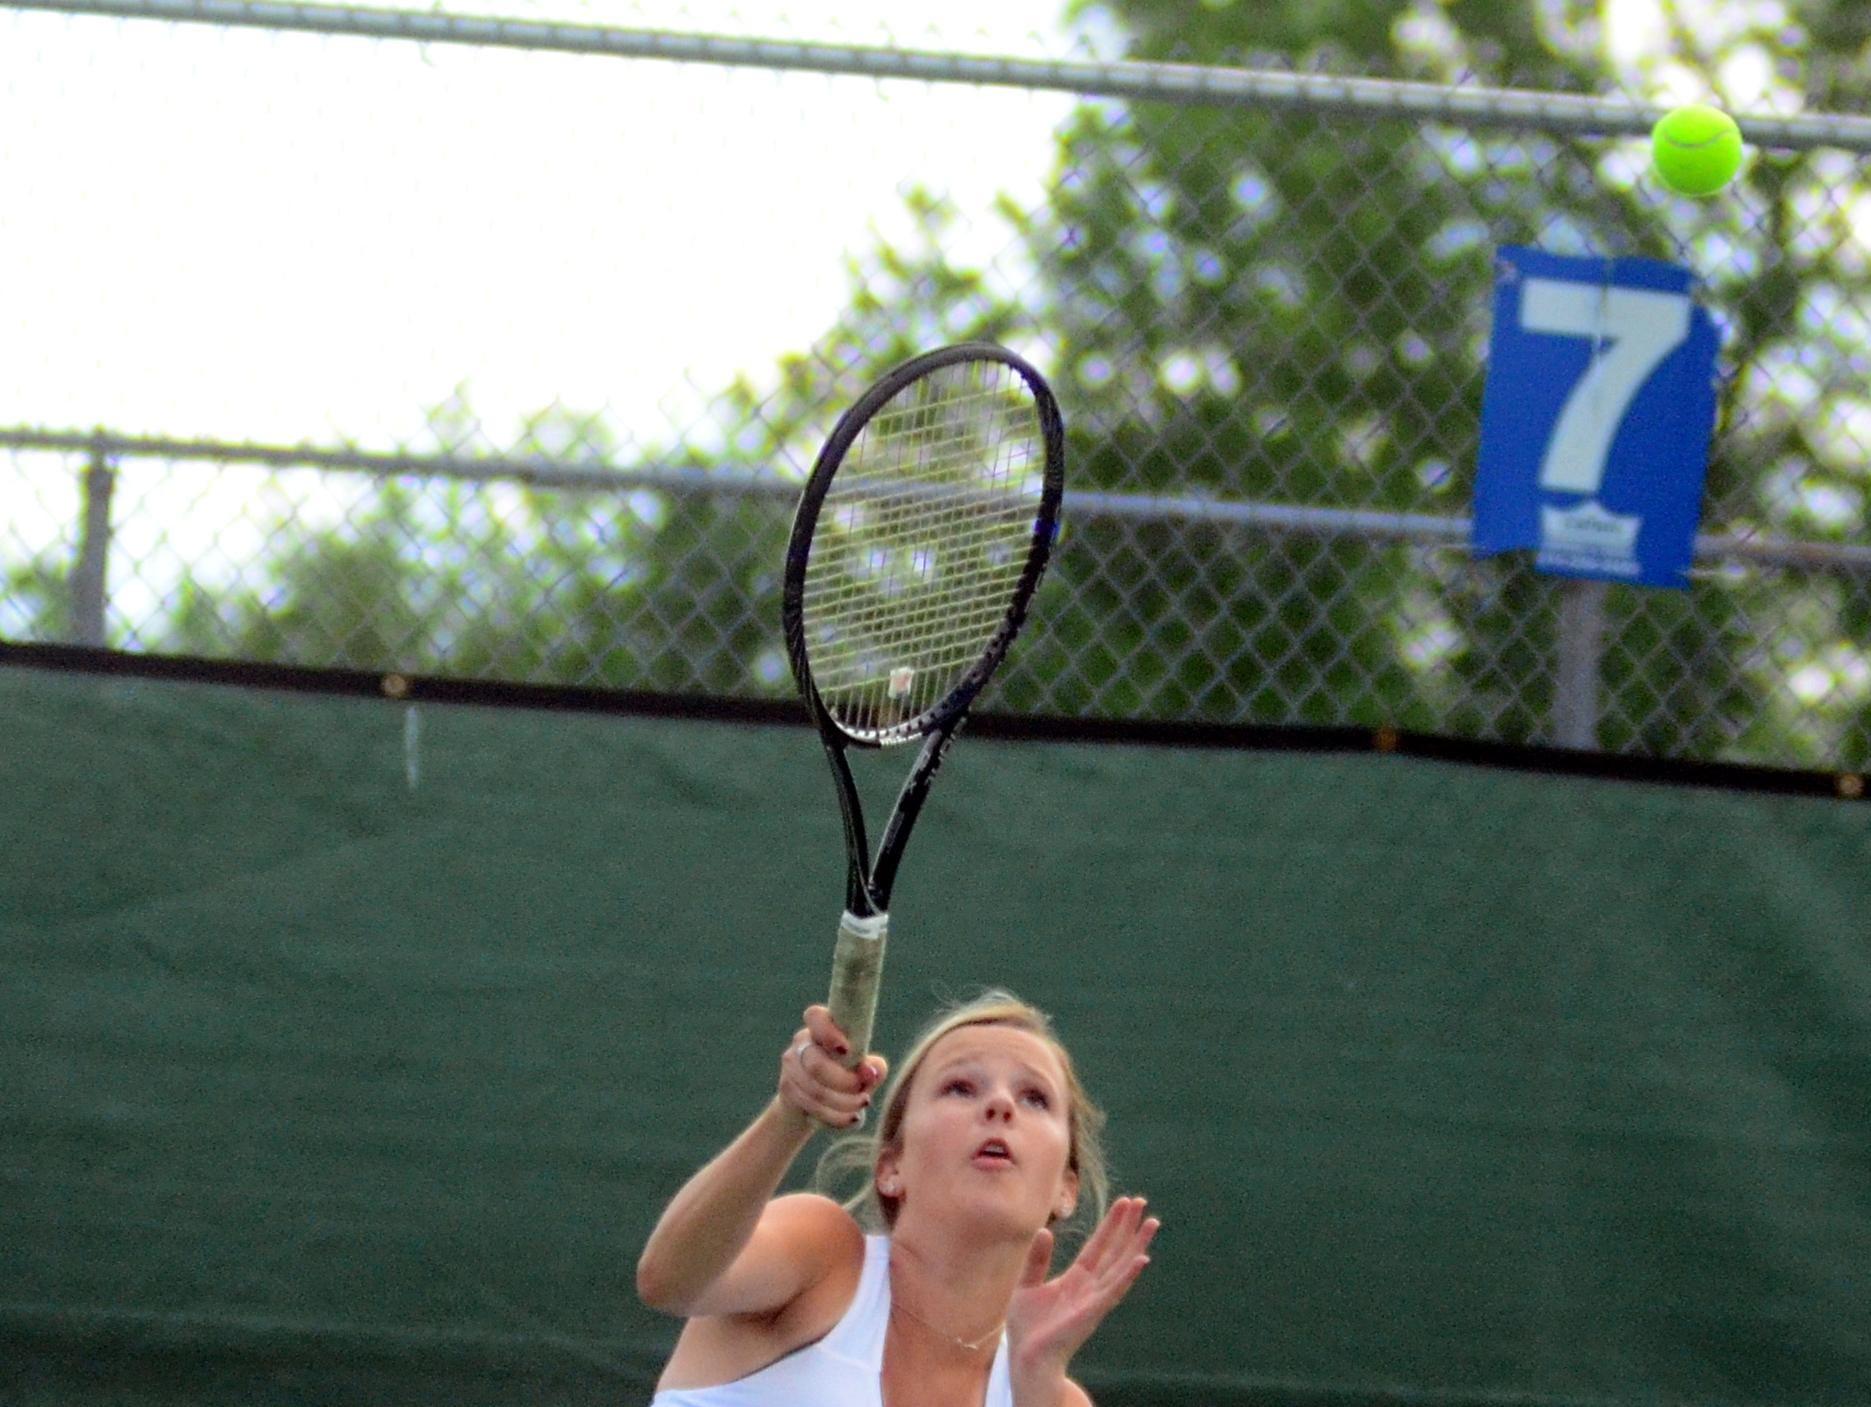 Hendersonville High sophomore Caroline Miller serves during Wednesday's doubles semifinals.